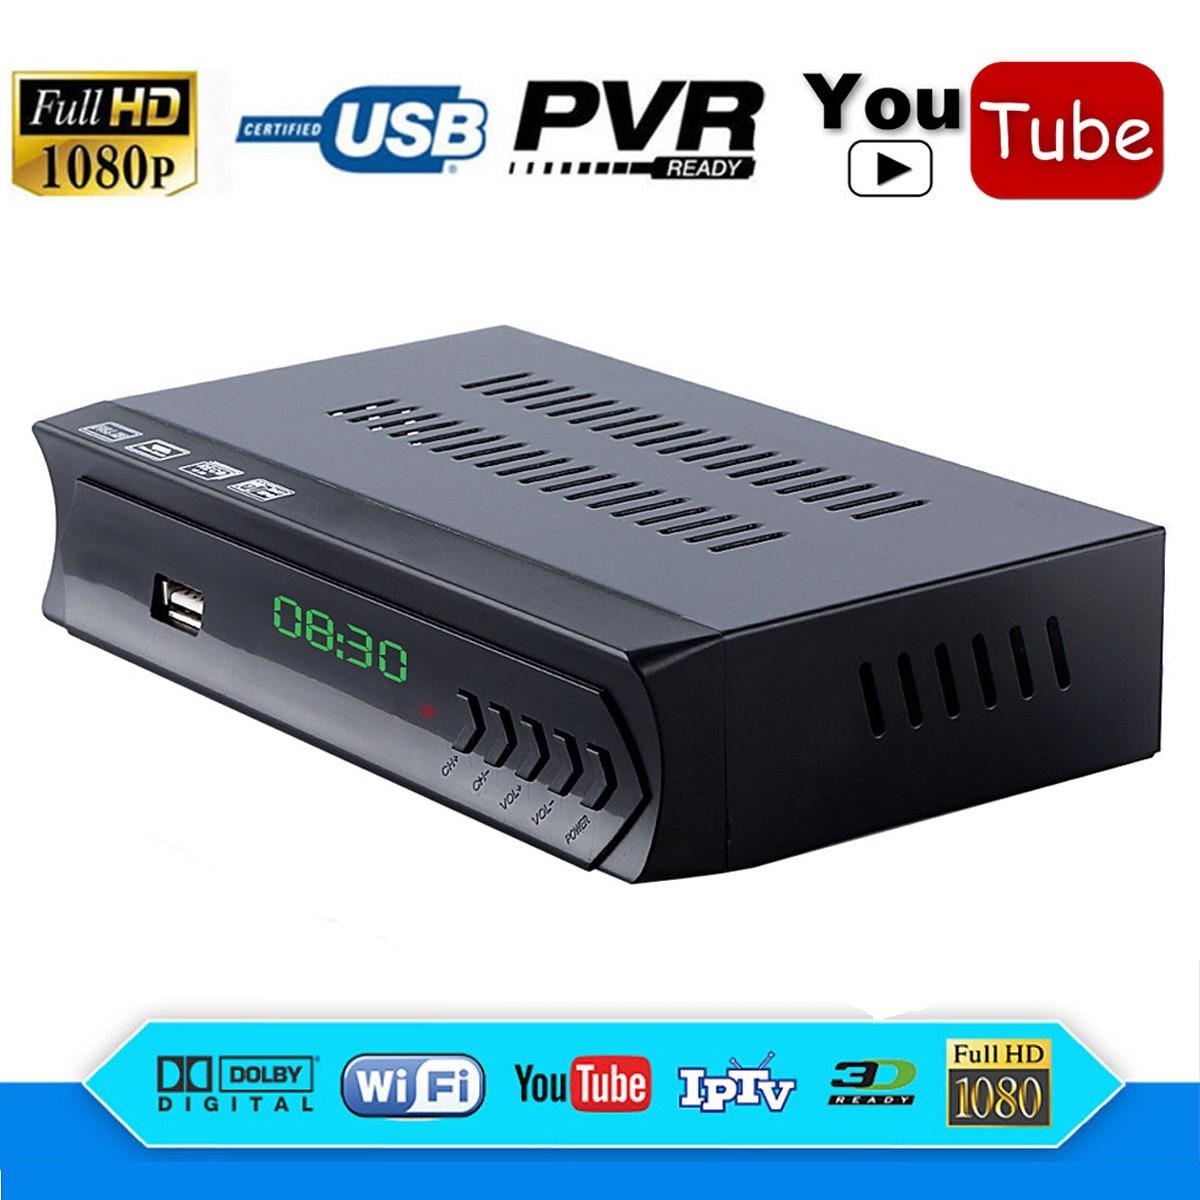 N/S In America Full HD FTA DVB-S2 Decoder Ricevitore Satellitare Digitale IPTV Player RJ45 Lan Wifi Youtube iks Cline newcam Biss vu EPG